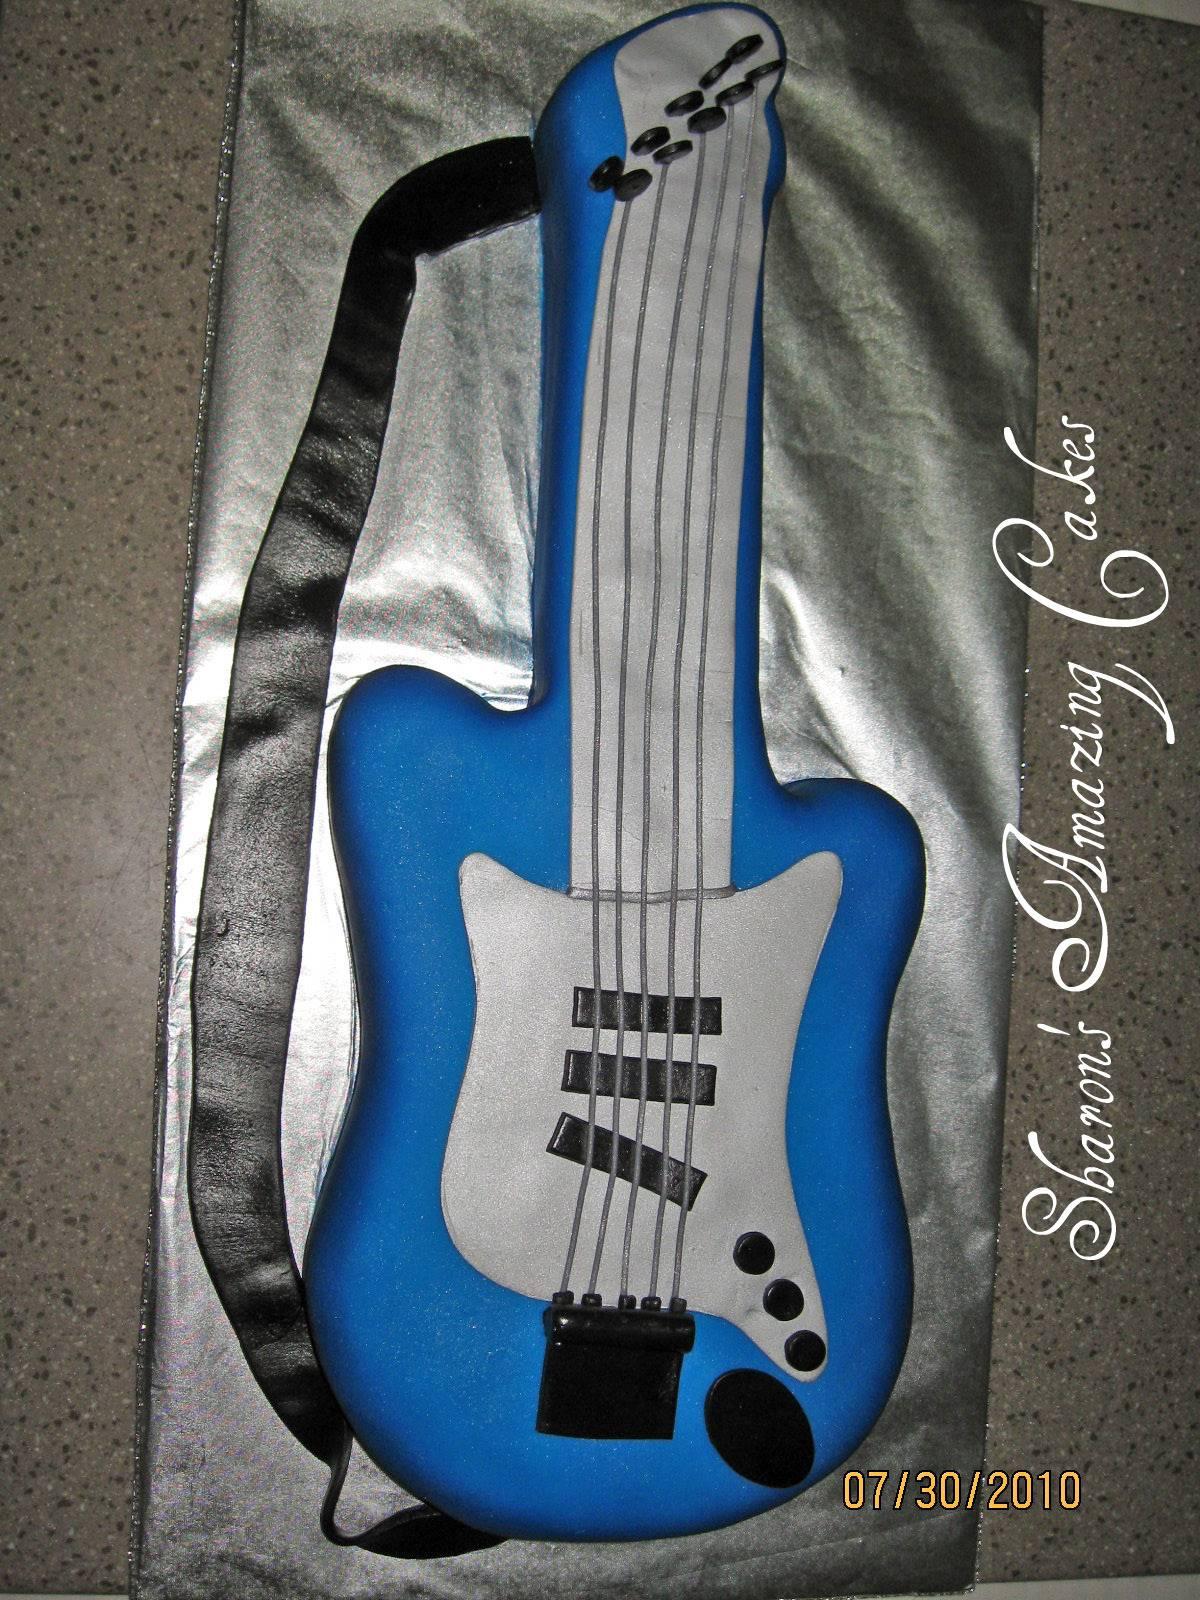 CAKE 11G -Guitar Cake 2